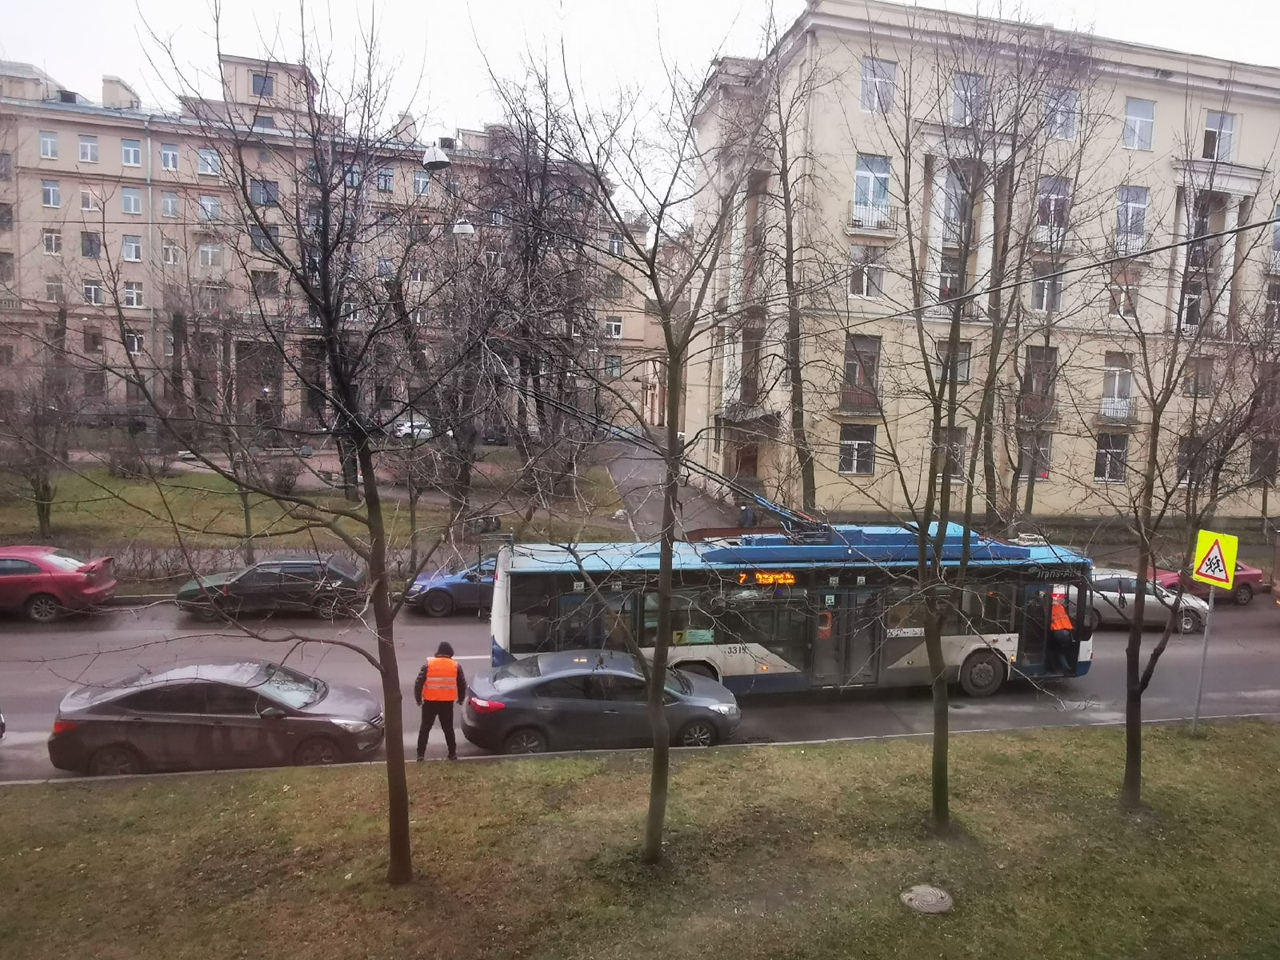 Из-за ДТП на Стахановцев 18 застрял троллейбус, проезд затруднён, общественный транспорт стоит. Хенд...